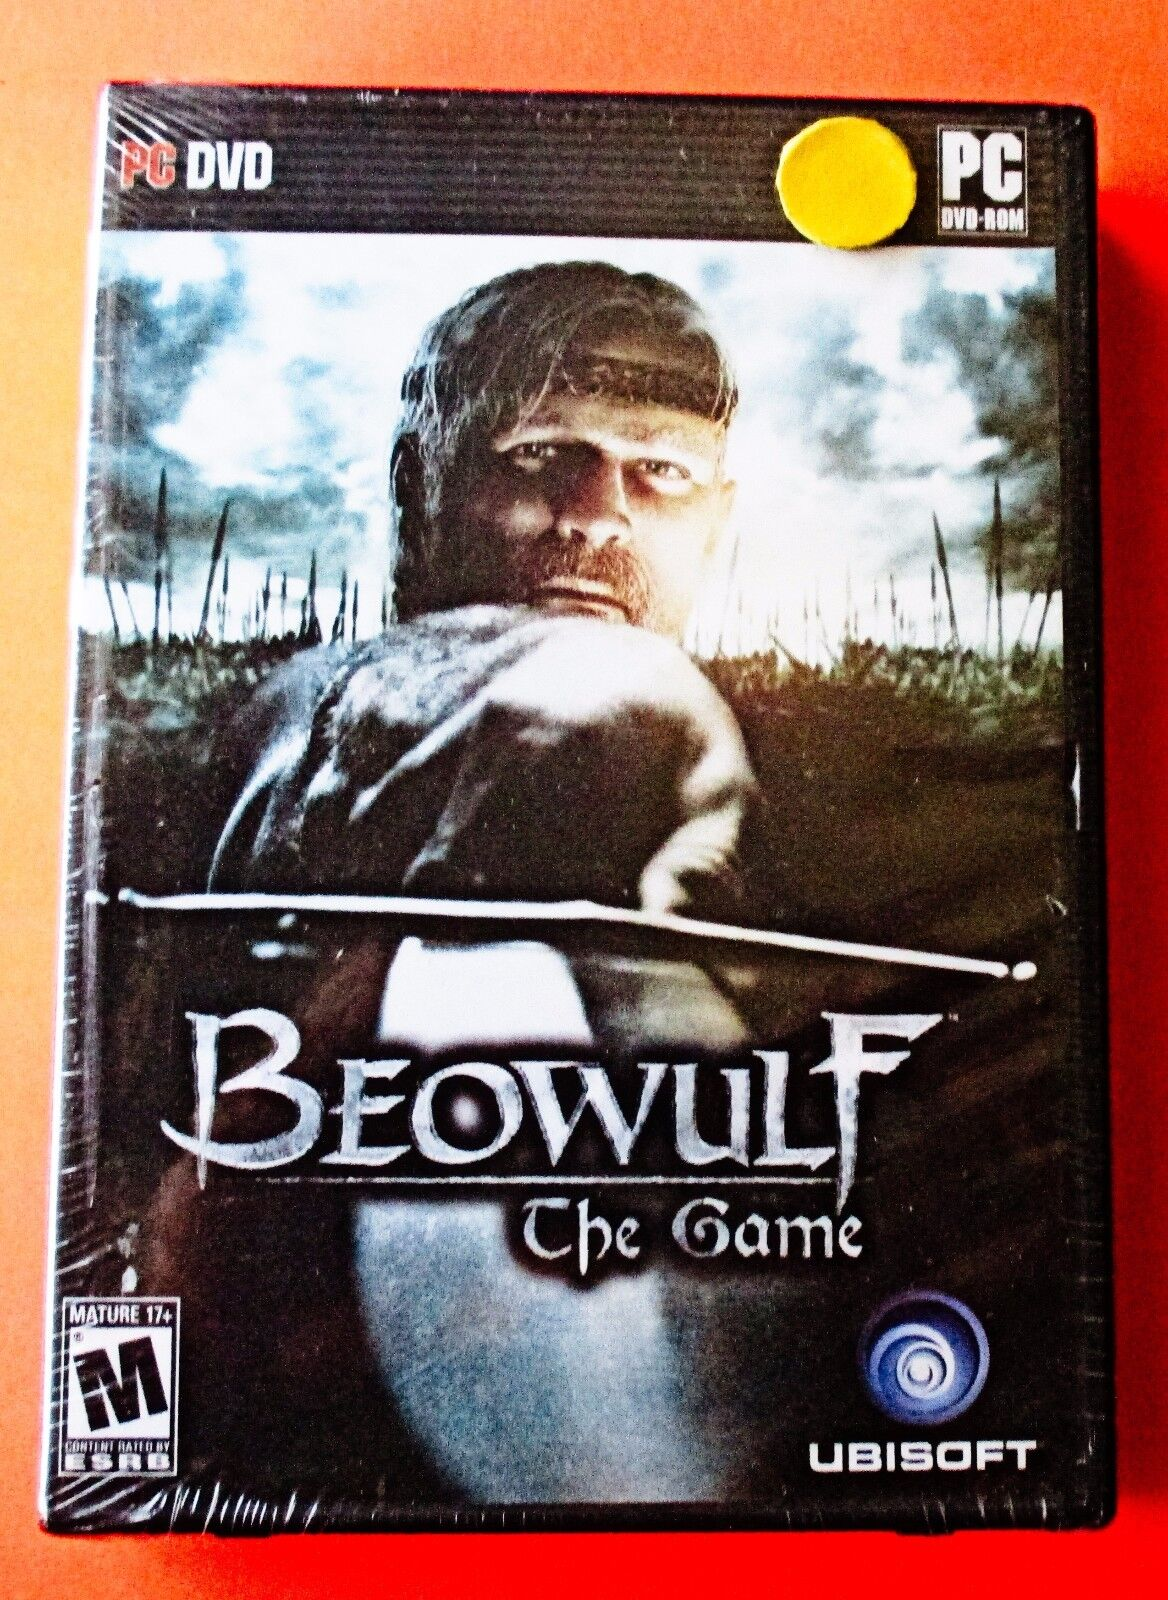 beowulf personality